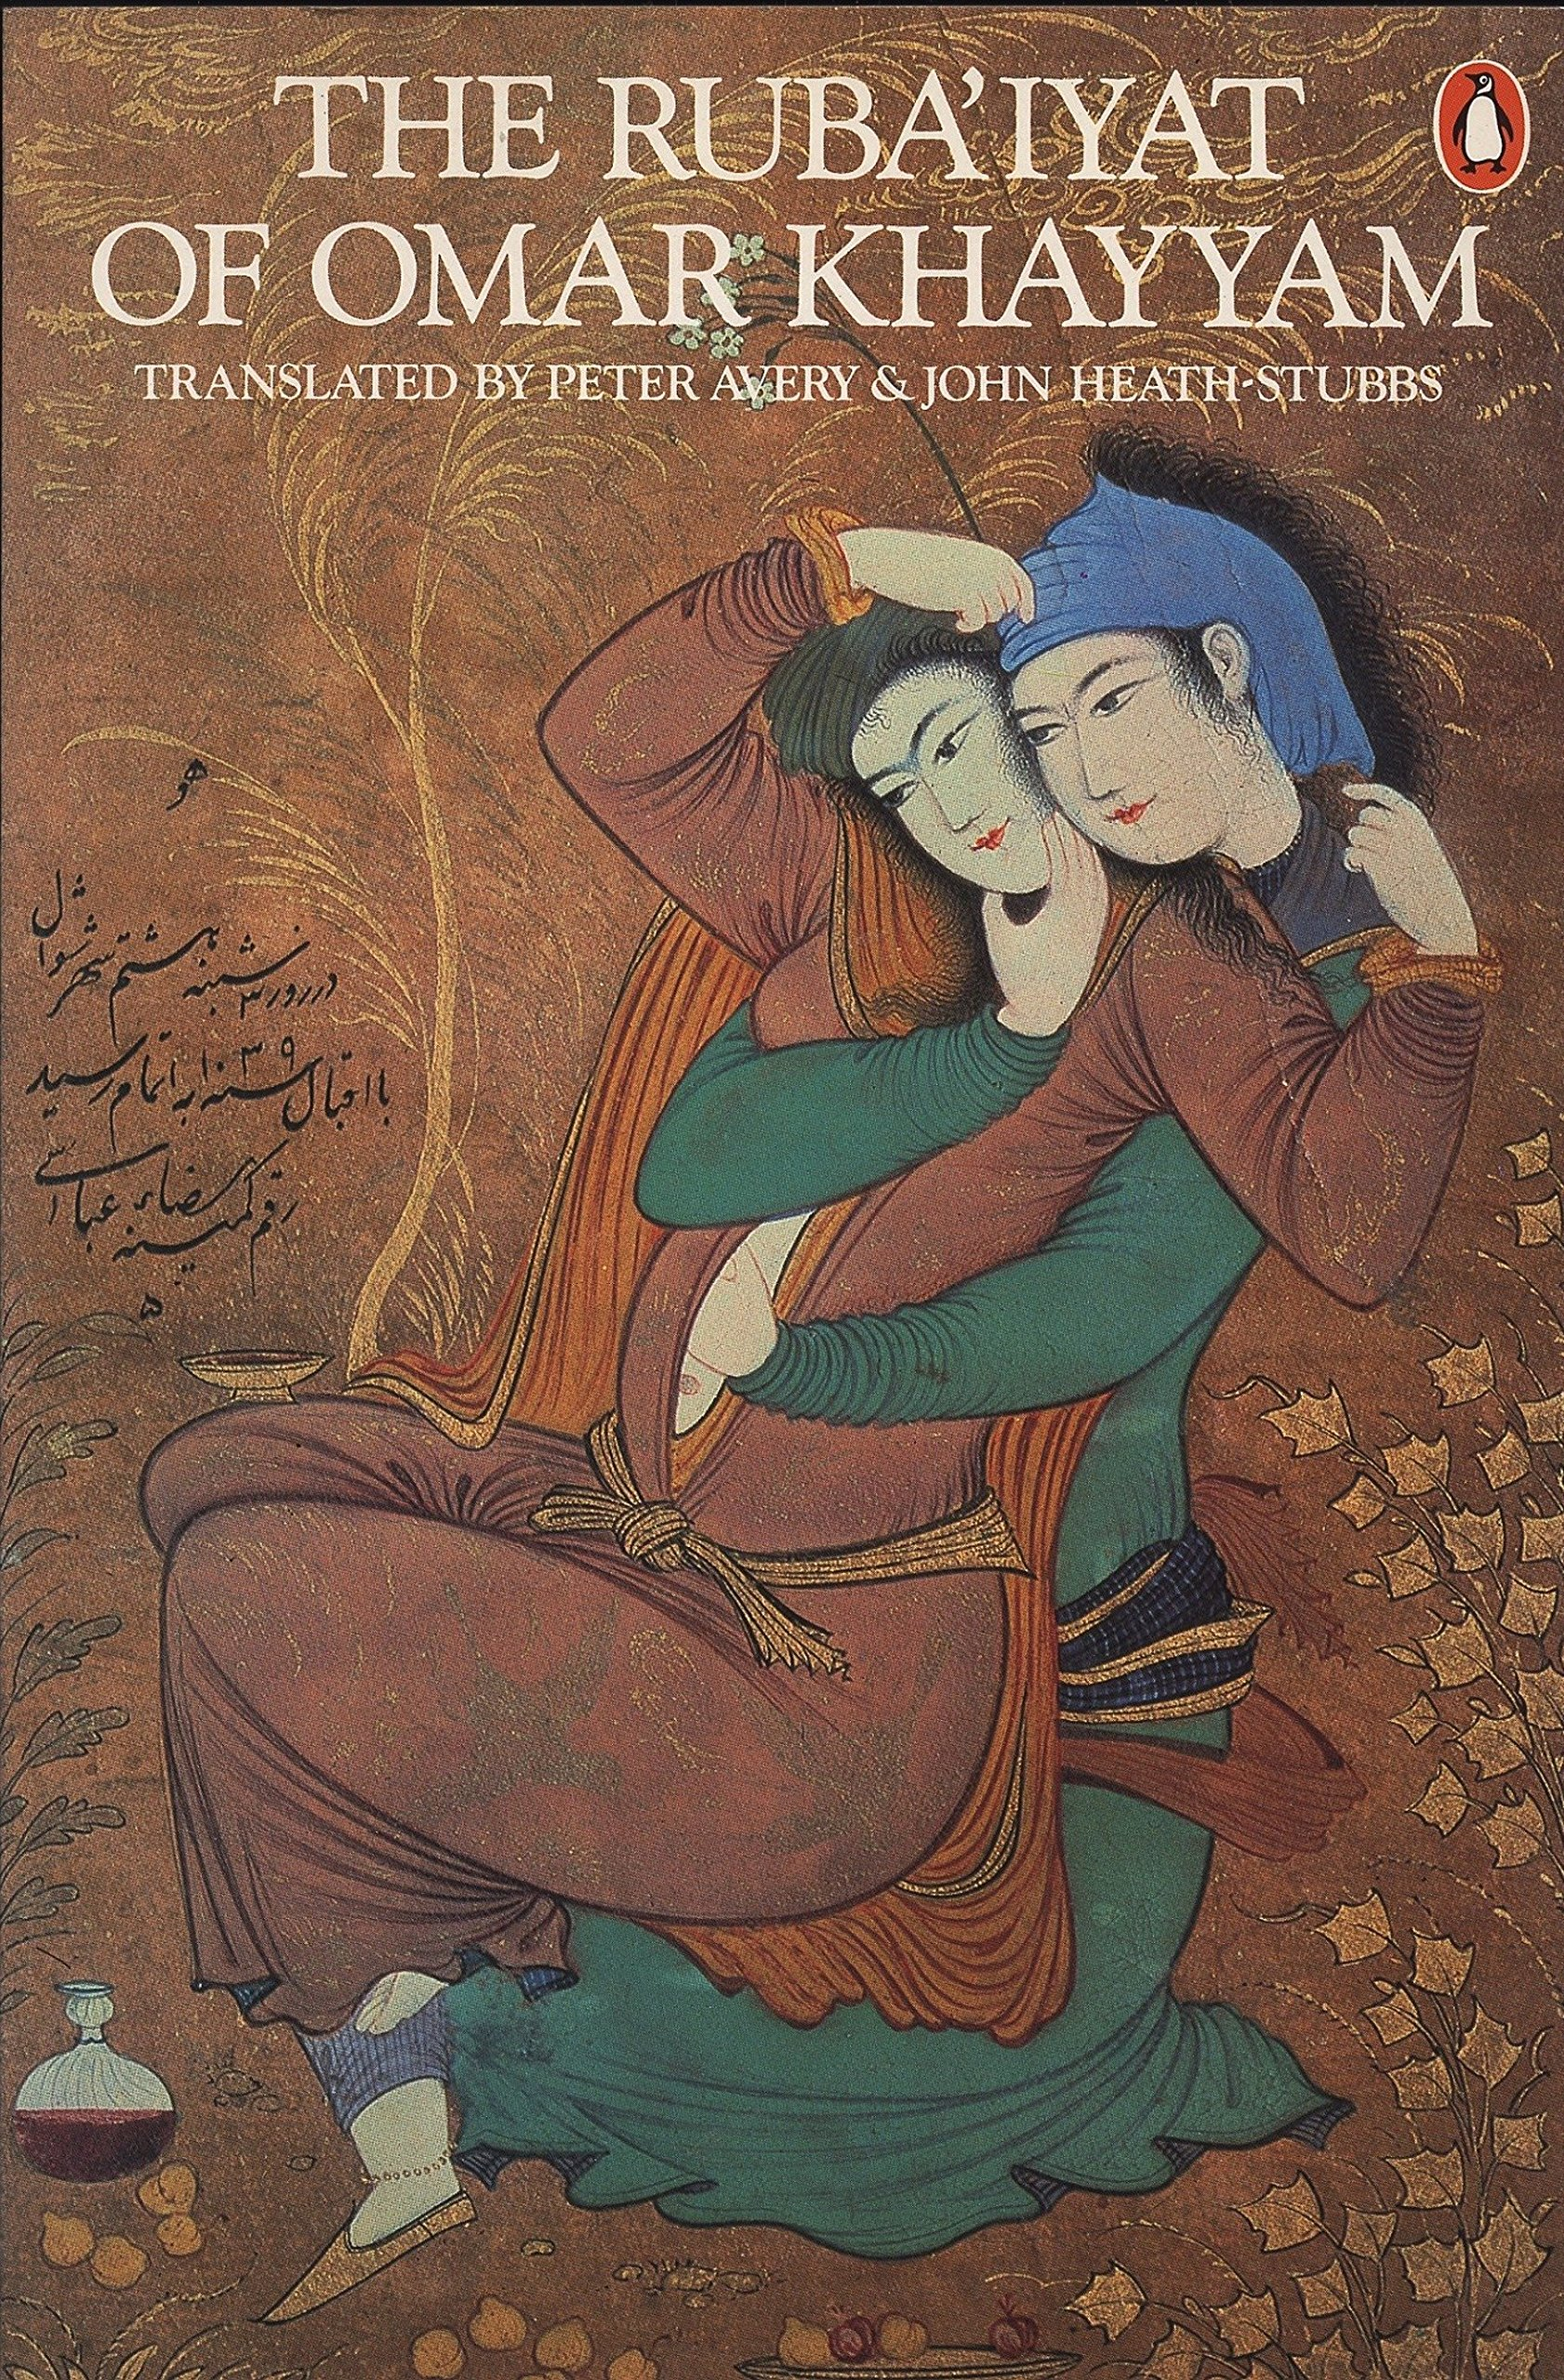 Rubaiyat of Omar Khayyam by Penguin Books